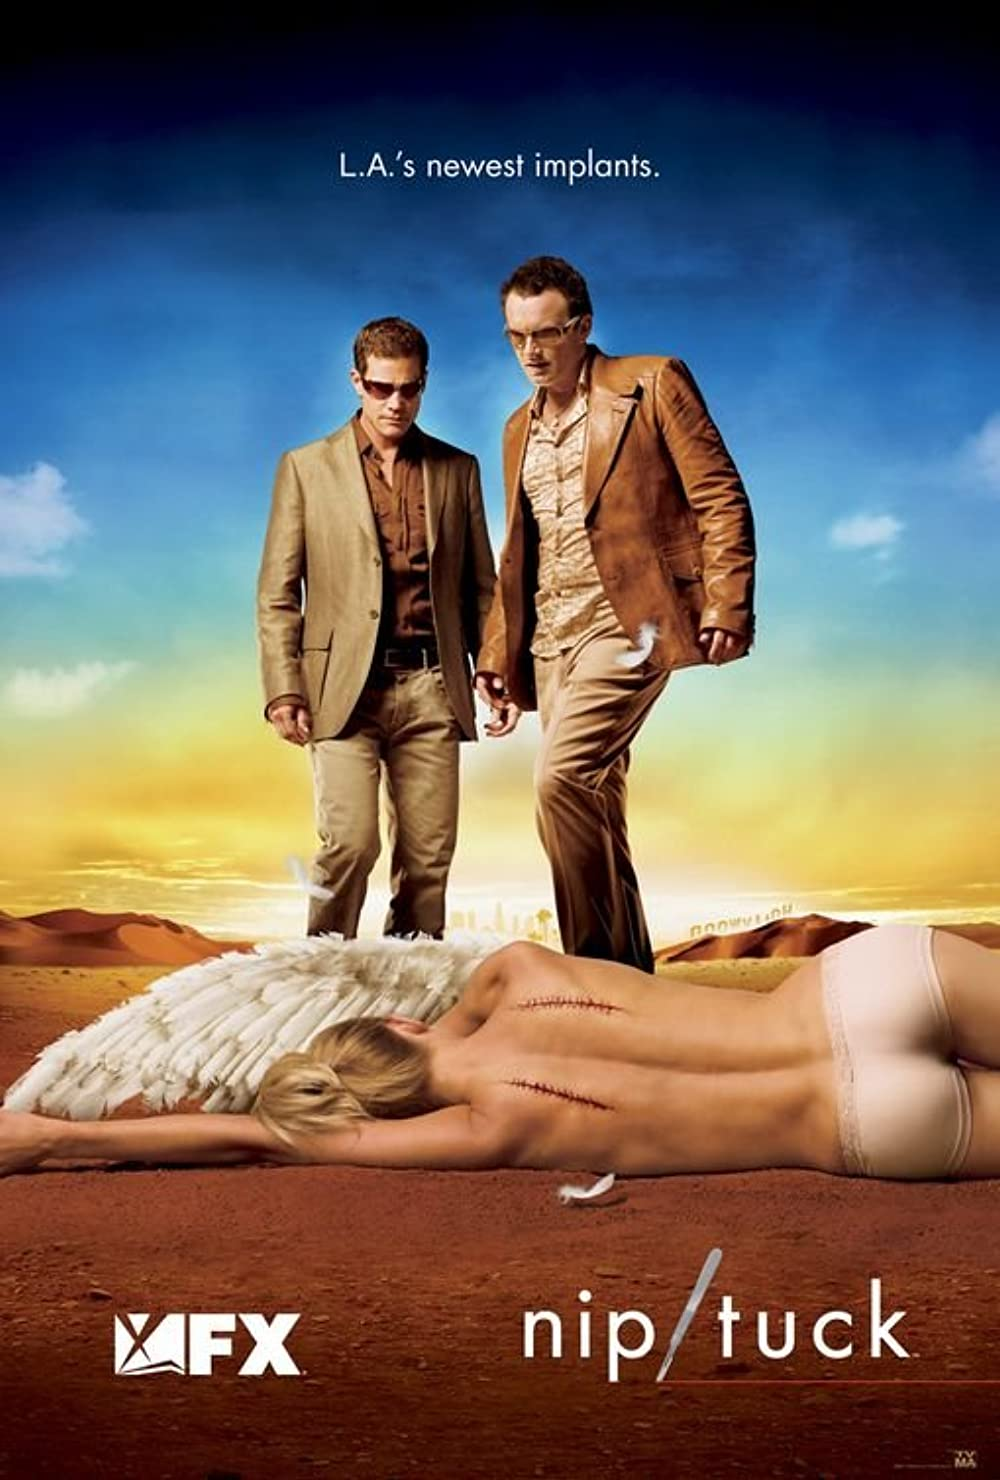 Nip/Tuck (TV Series 2003–2010) - IMDb